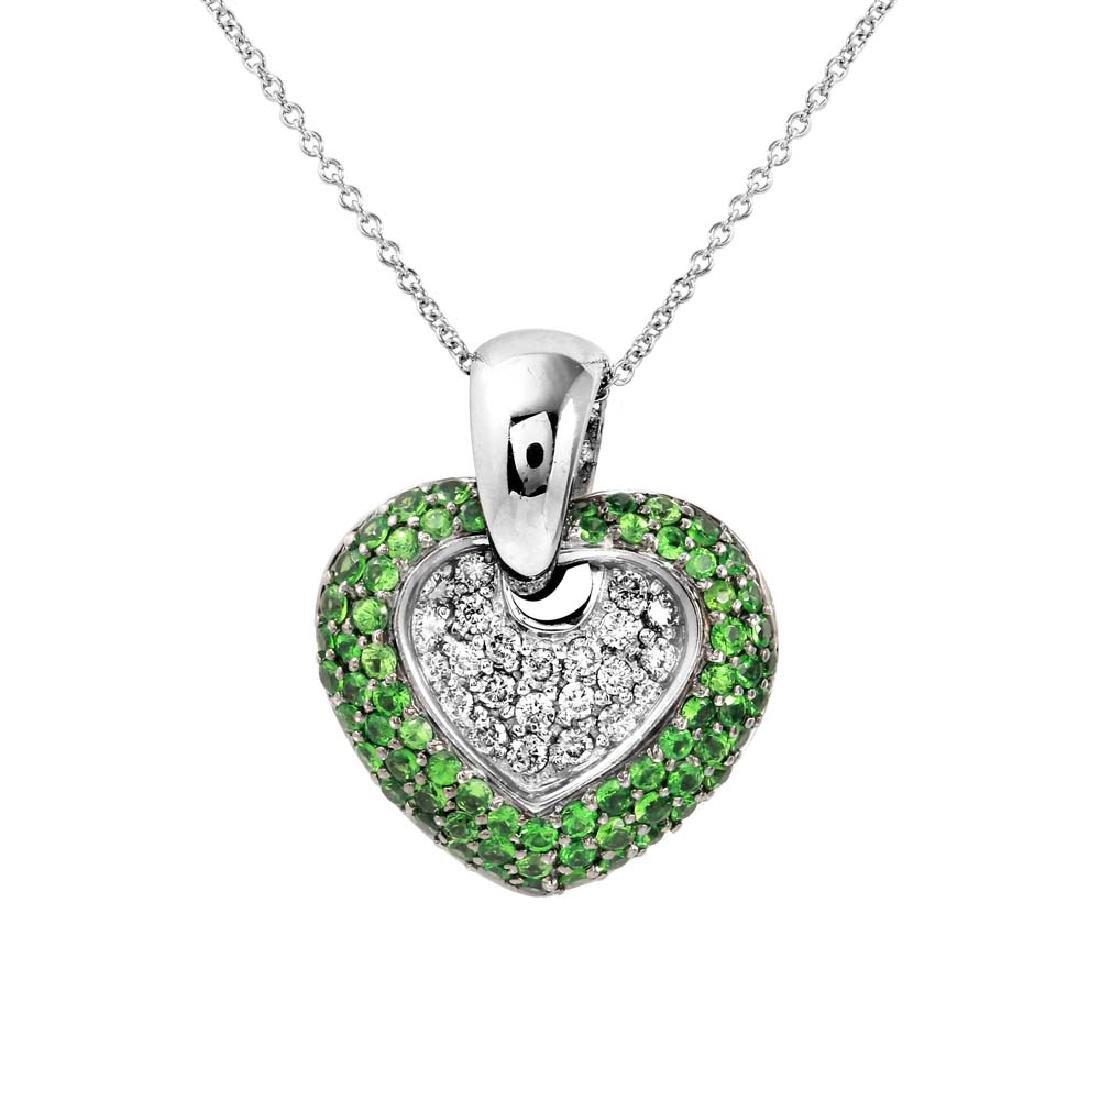 Genuine 1.63 TCW 14K White Gold Ladies Necklace